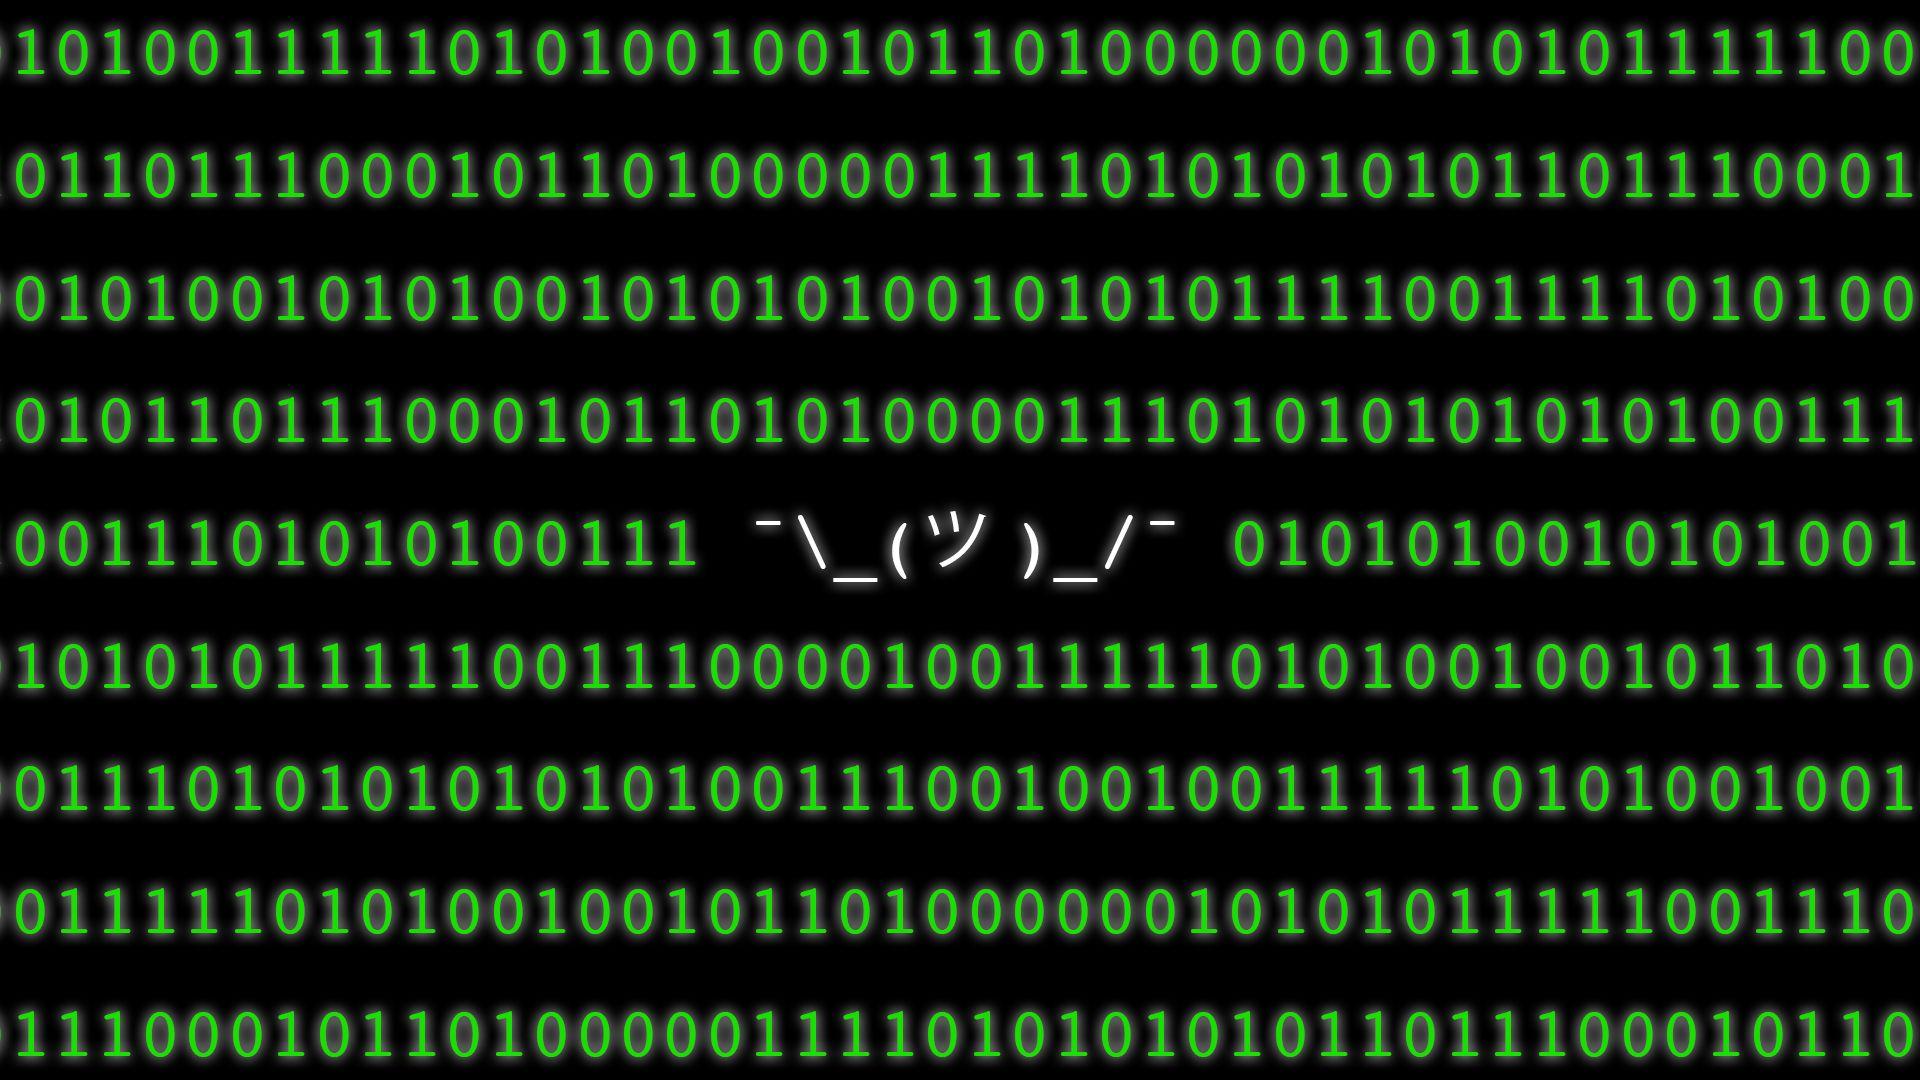 Illustration of binary code with the shrugging ascii art, ¯\_(ツ )_/¯